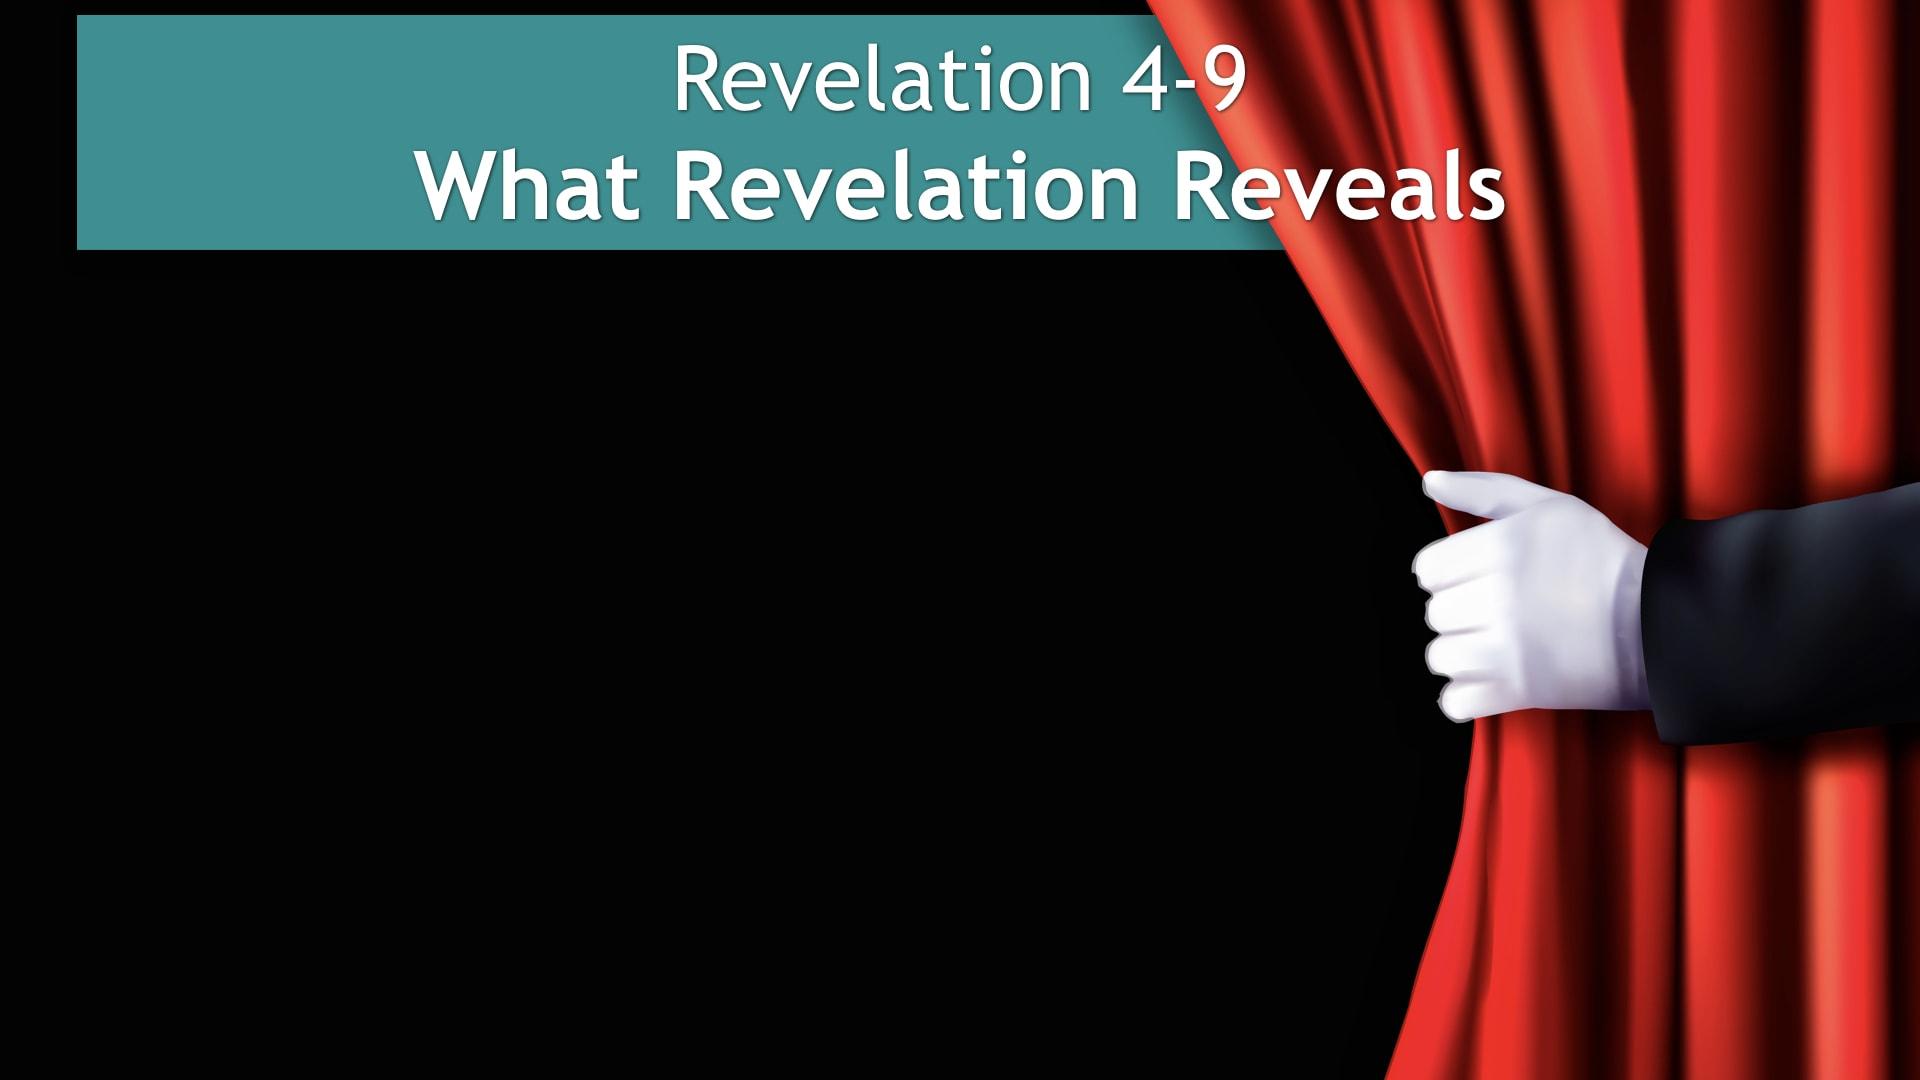 Revelation 4-9, What Revelation Reveals